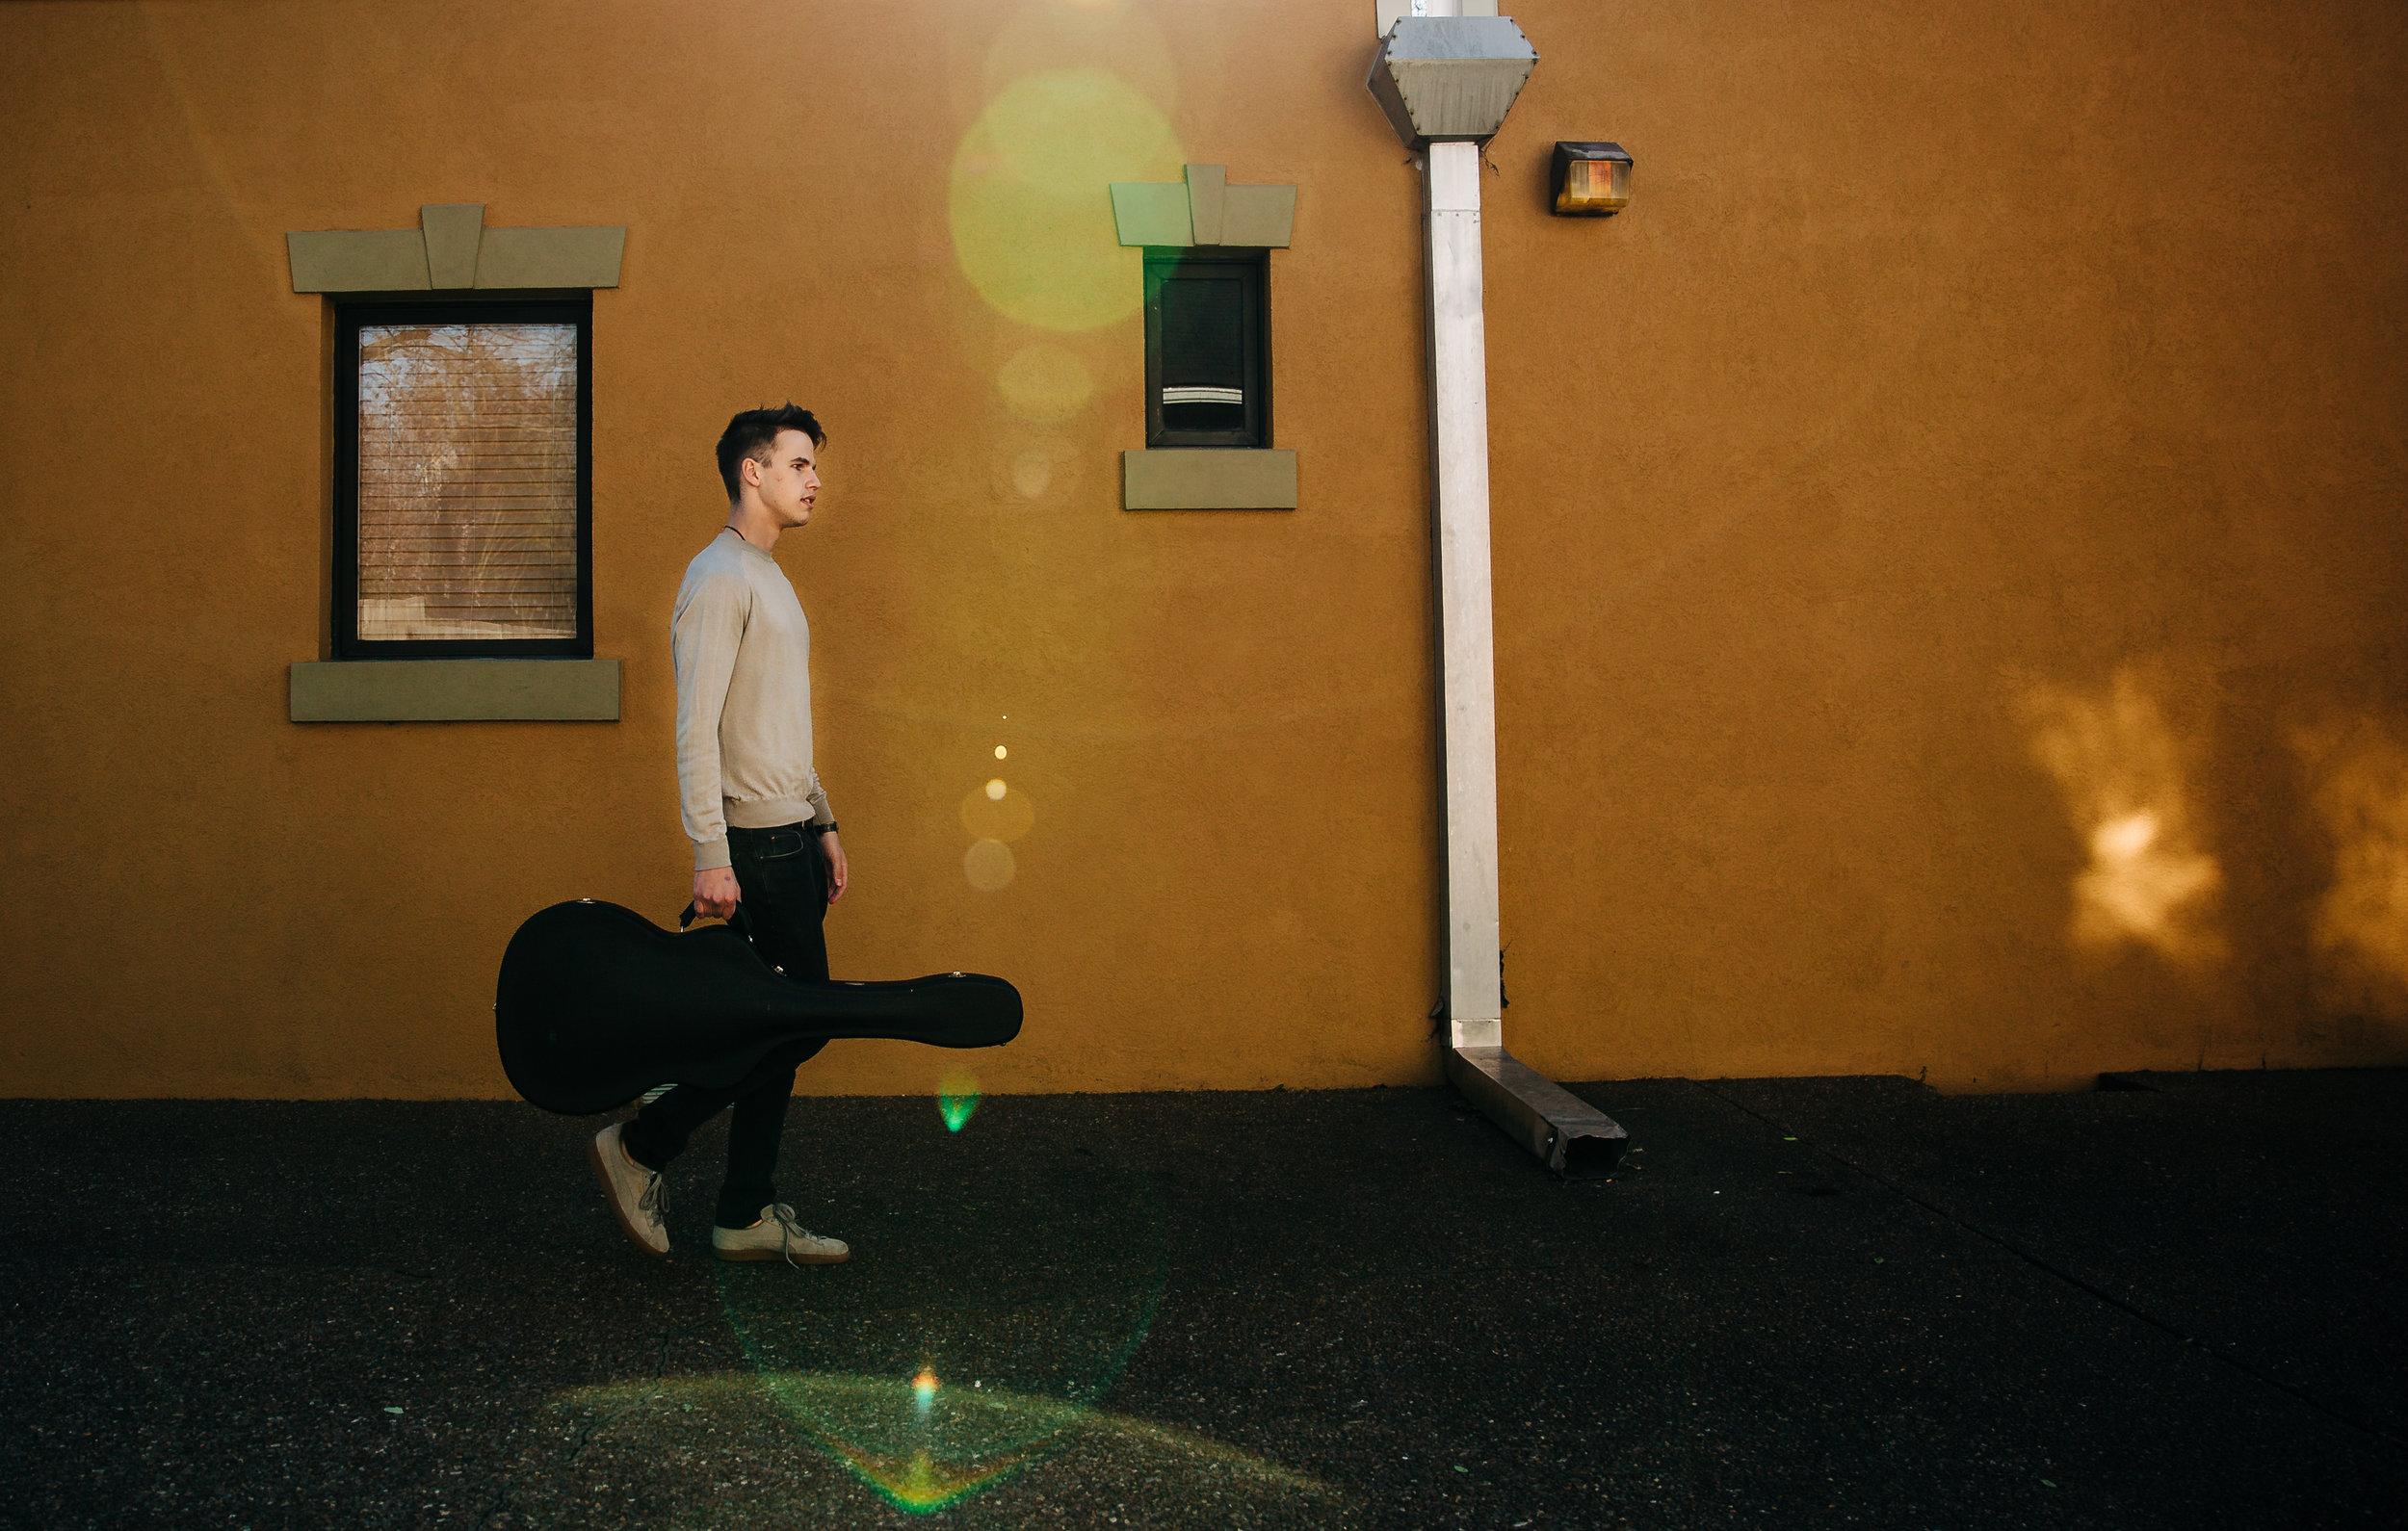 lifestyle-photographer-senior-session-downtown-franklin-6.jpg